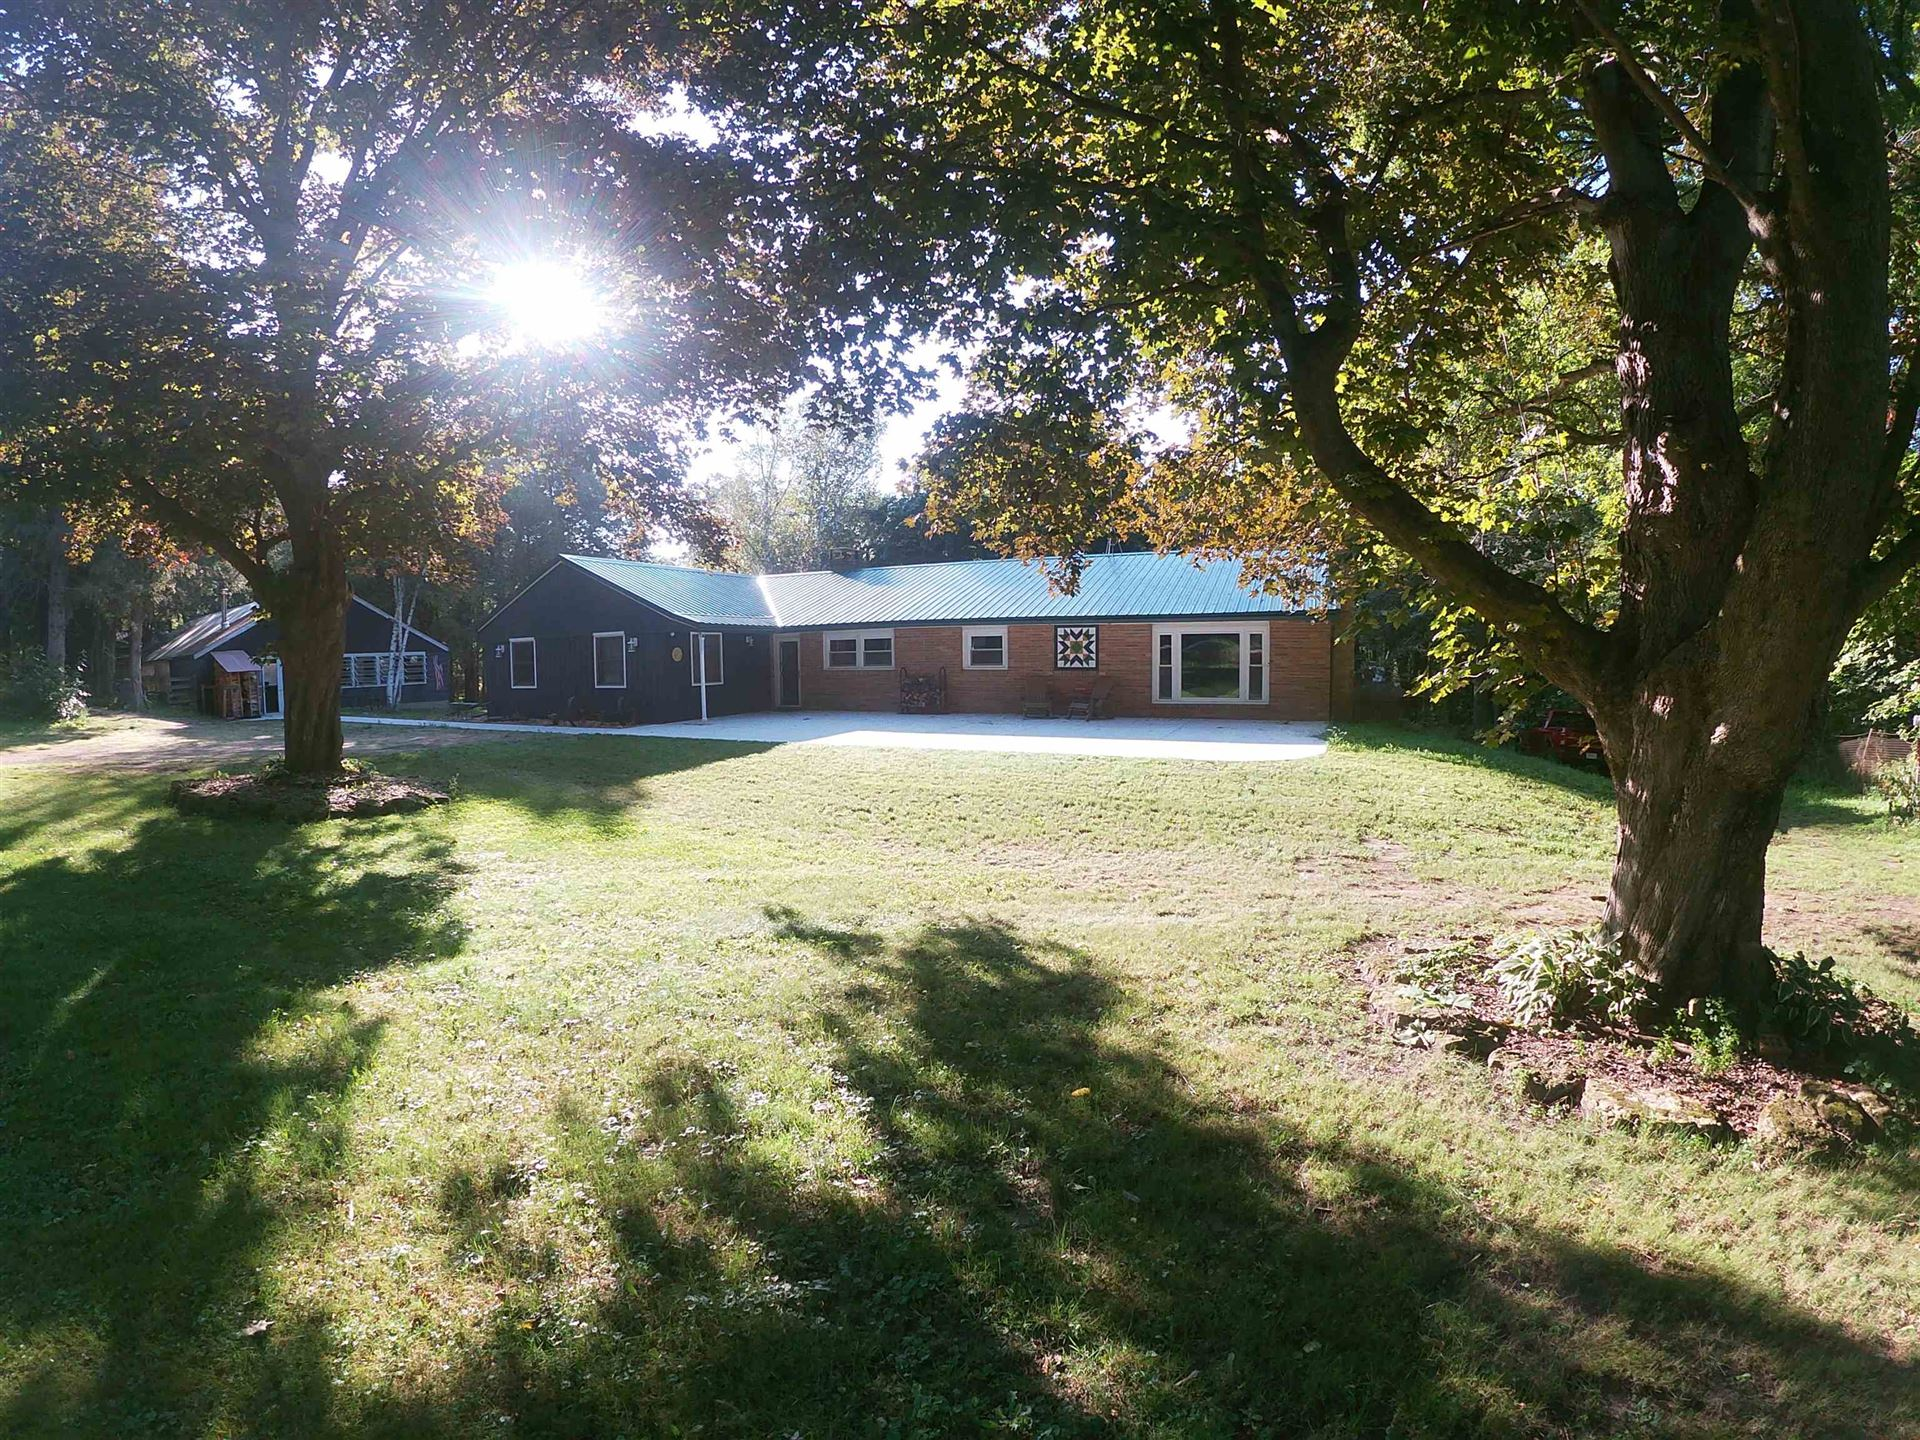 11044 E Creek Rd, Clinton, WI 53525 - #: 1918597